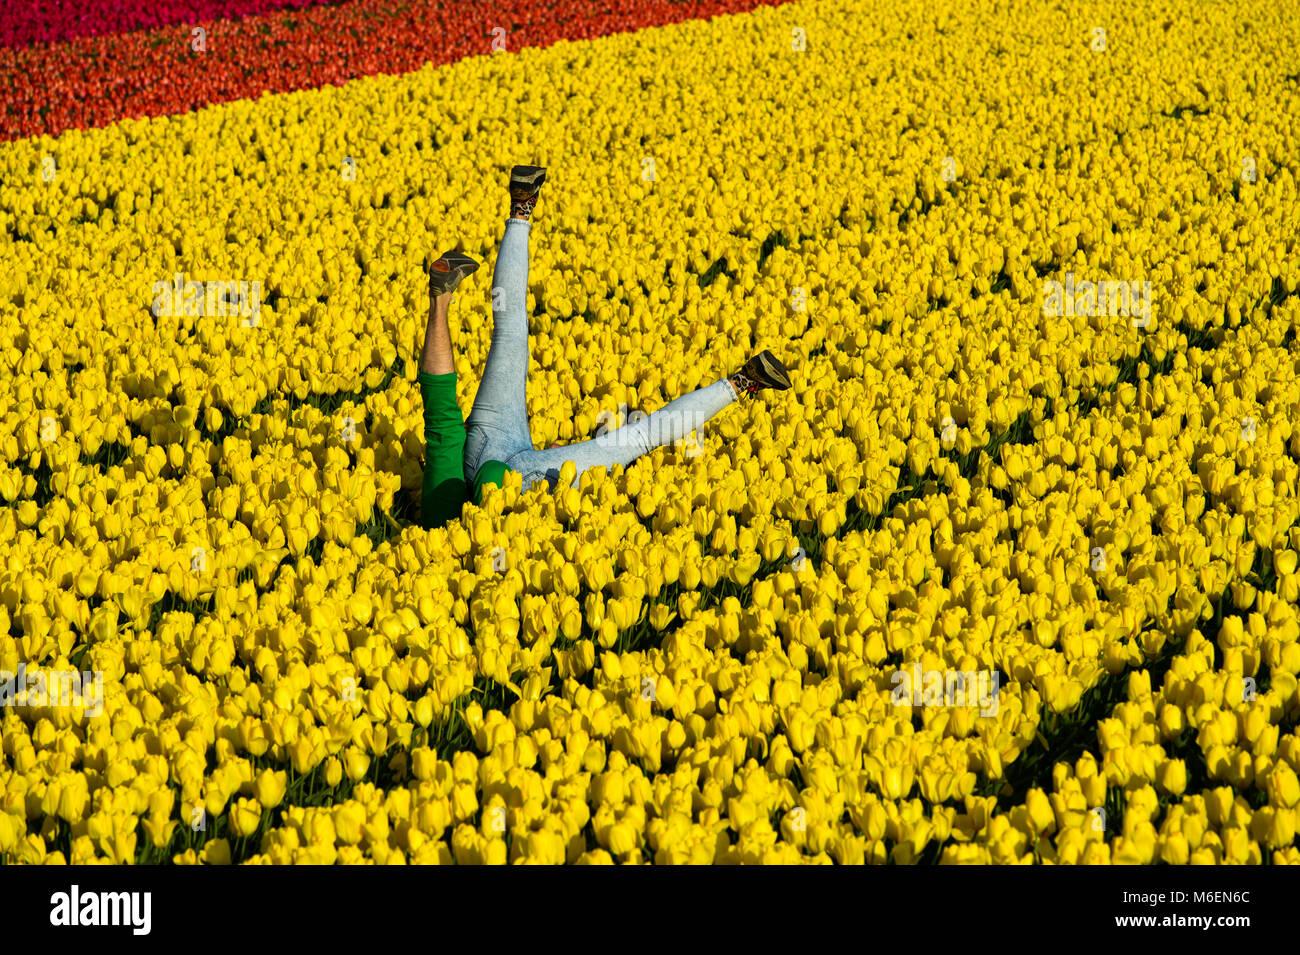 Couple having fun in a field of yellow tulips, Bollenstreek area, Noordwijkerhout, Netherlands - Stock Image